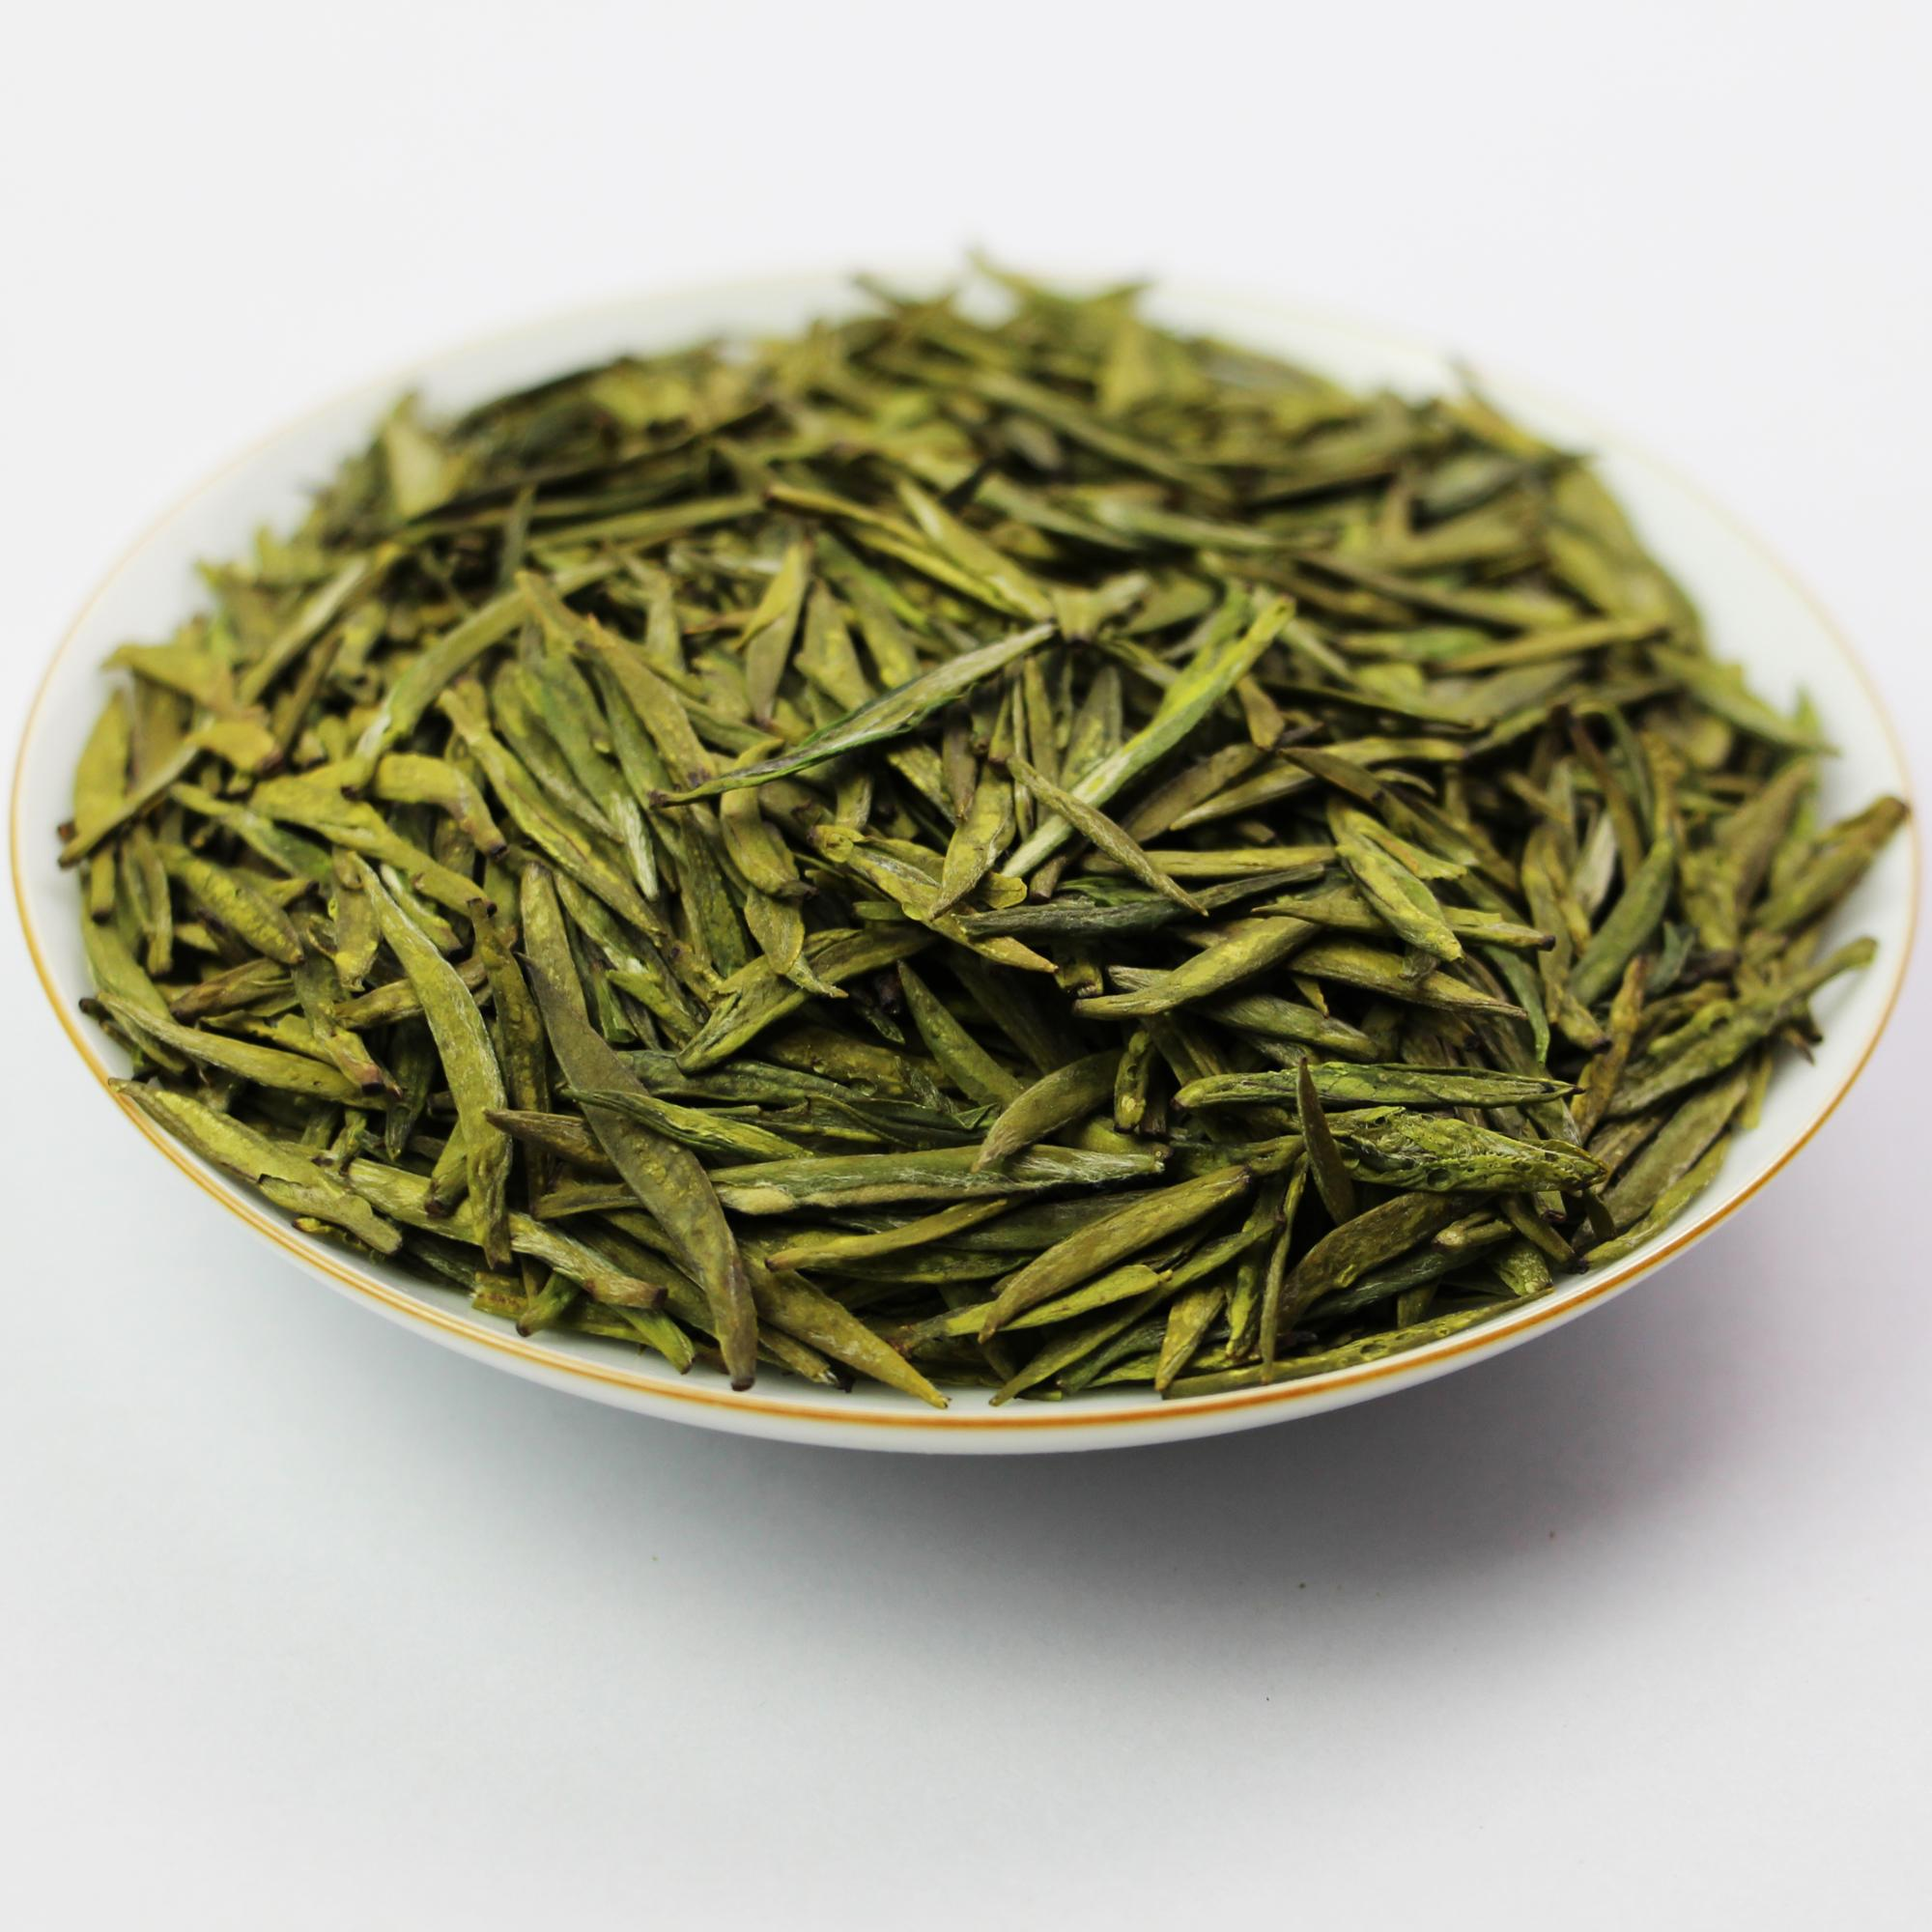 4A 入札芽高品質超自然スリム有機麦茶中国ギフト卸売減量緑茶